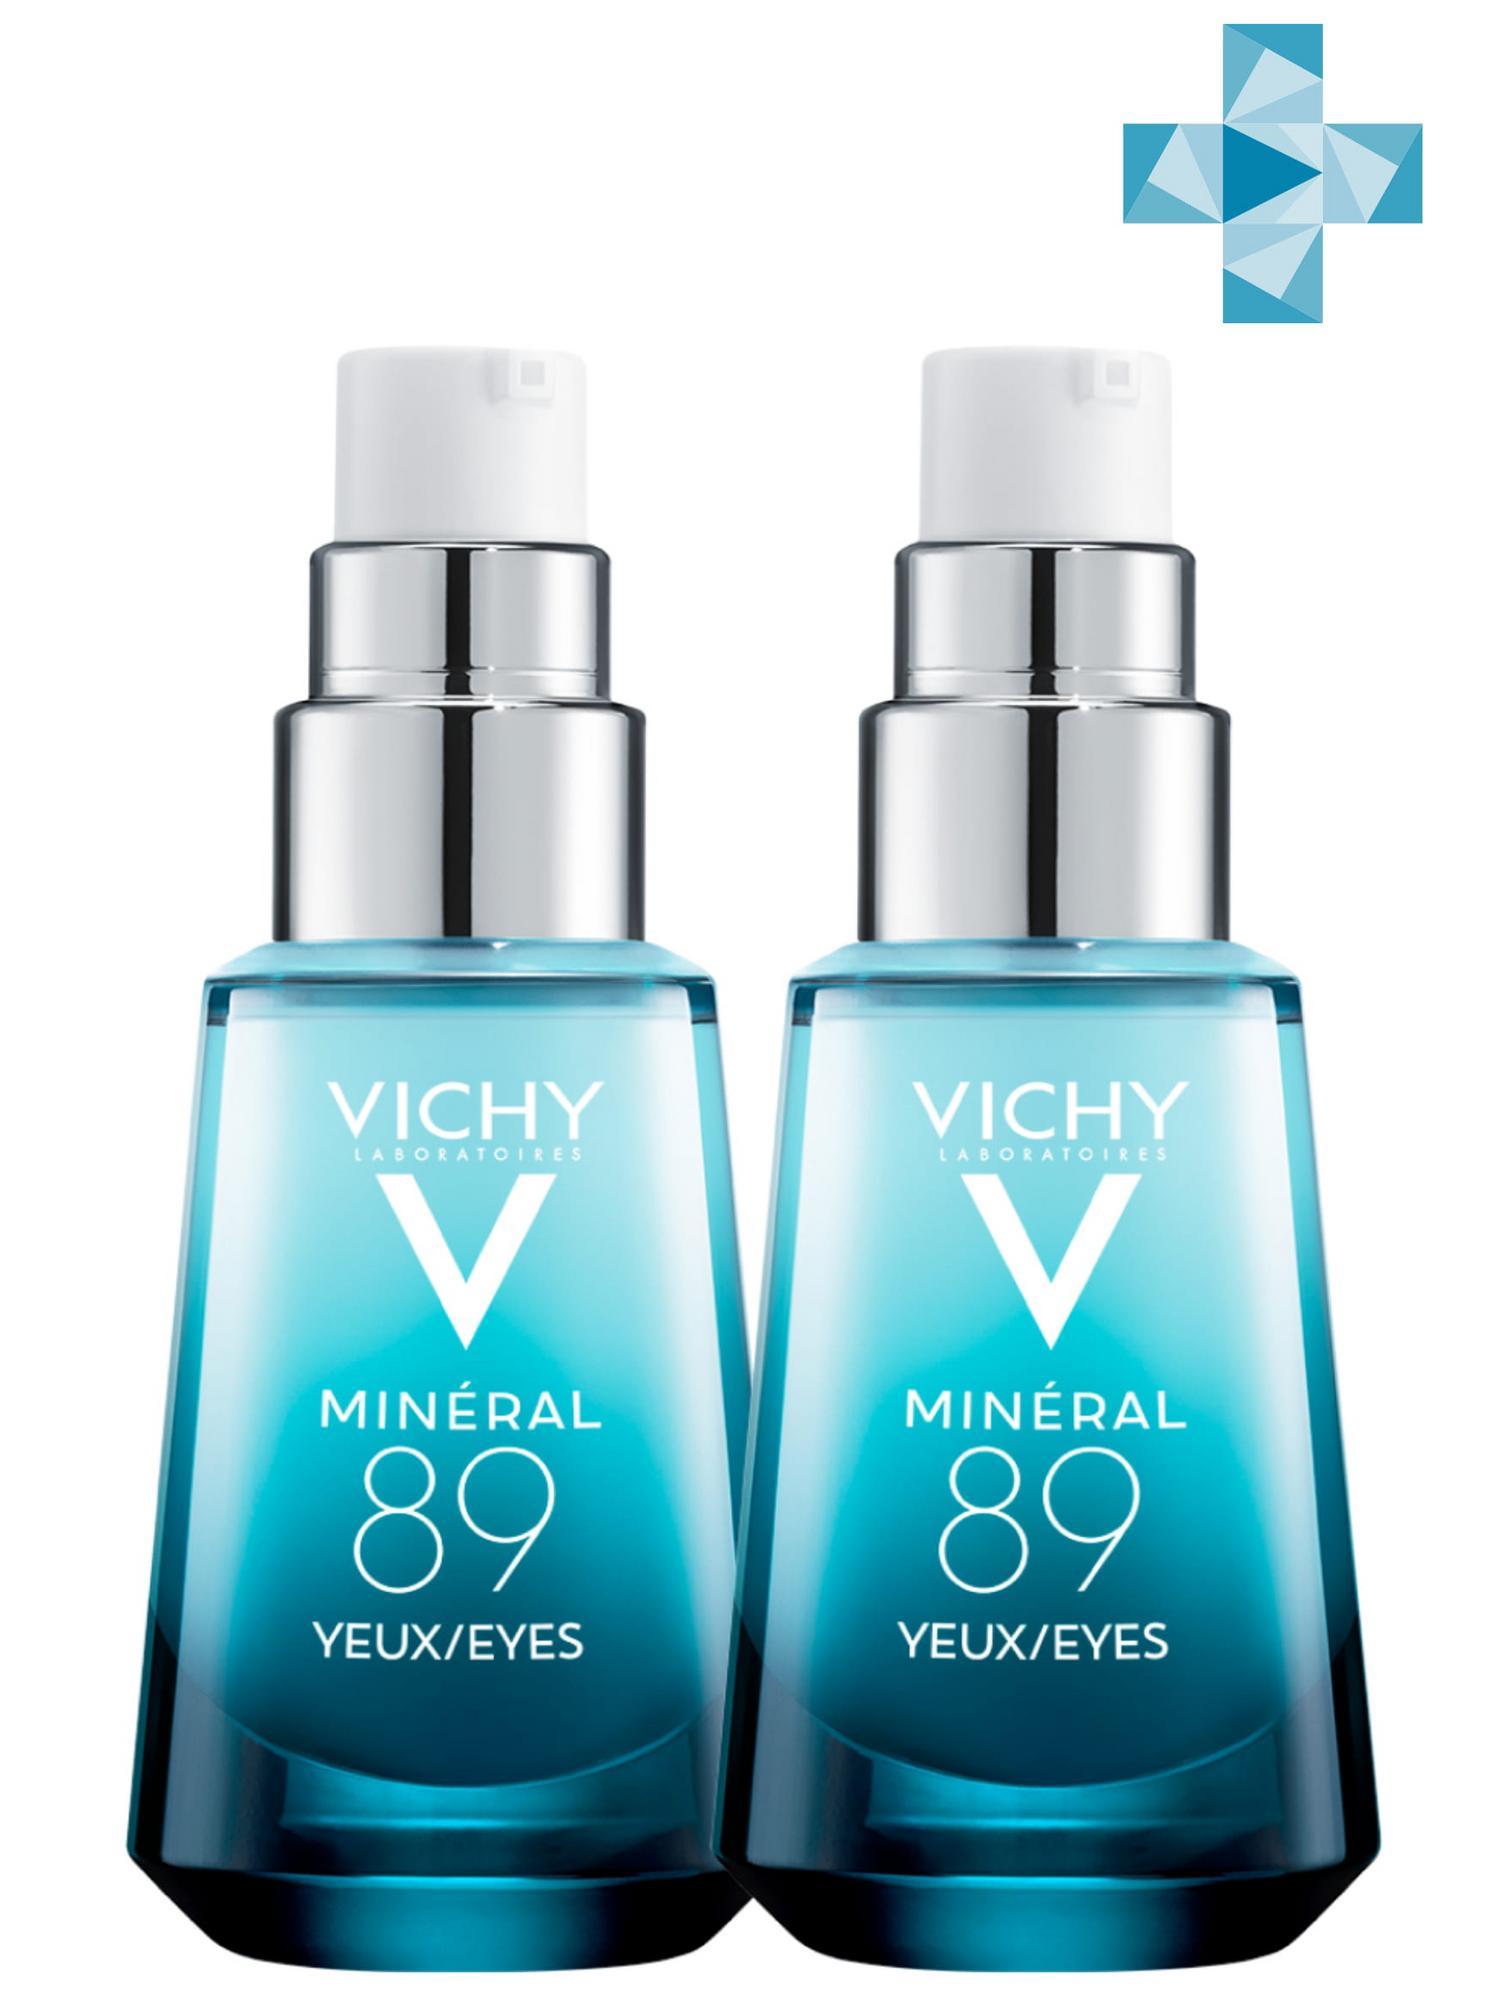 Купить Vichy Комплект Mineral 89 Восстанавливающий и укрепляющий уход для кожи вокруг глаз, 2 шт. по 15 мл (Vichy, Mineral 89), Франция